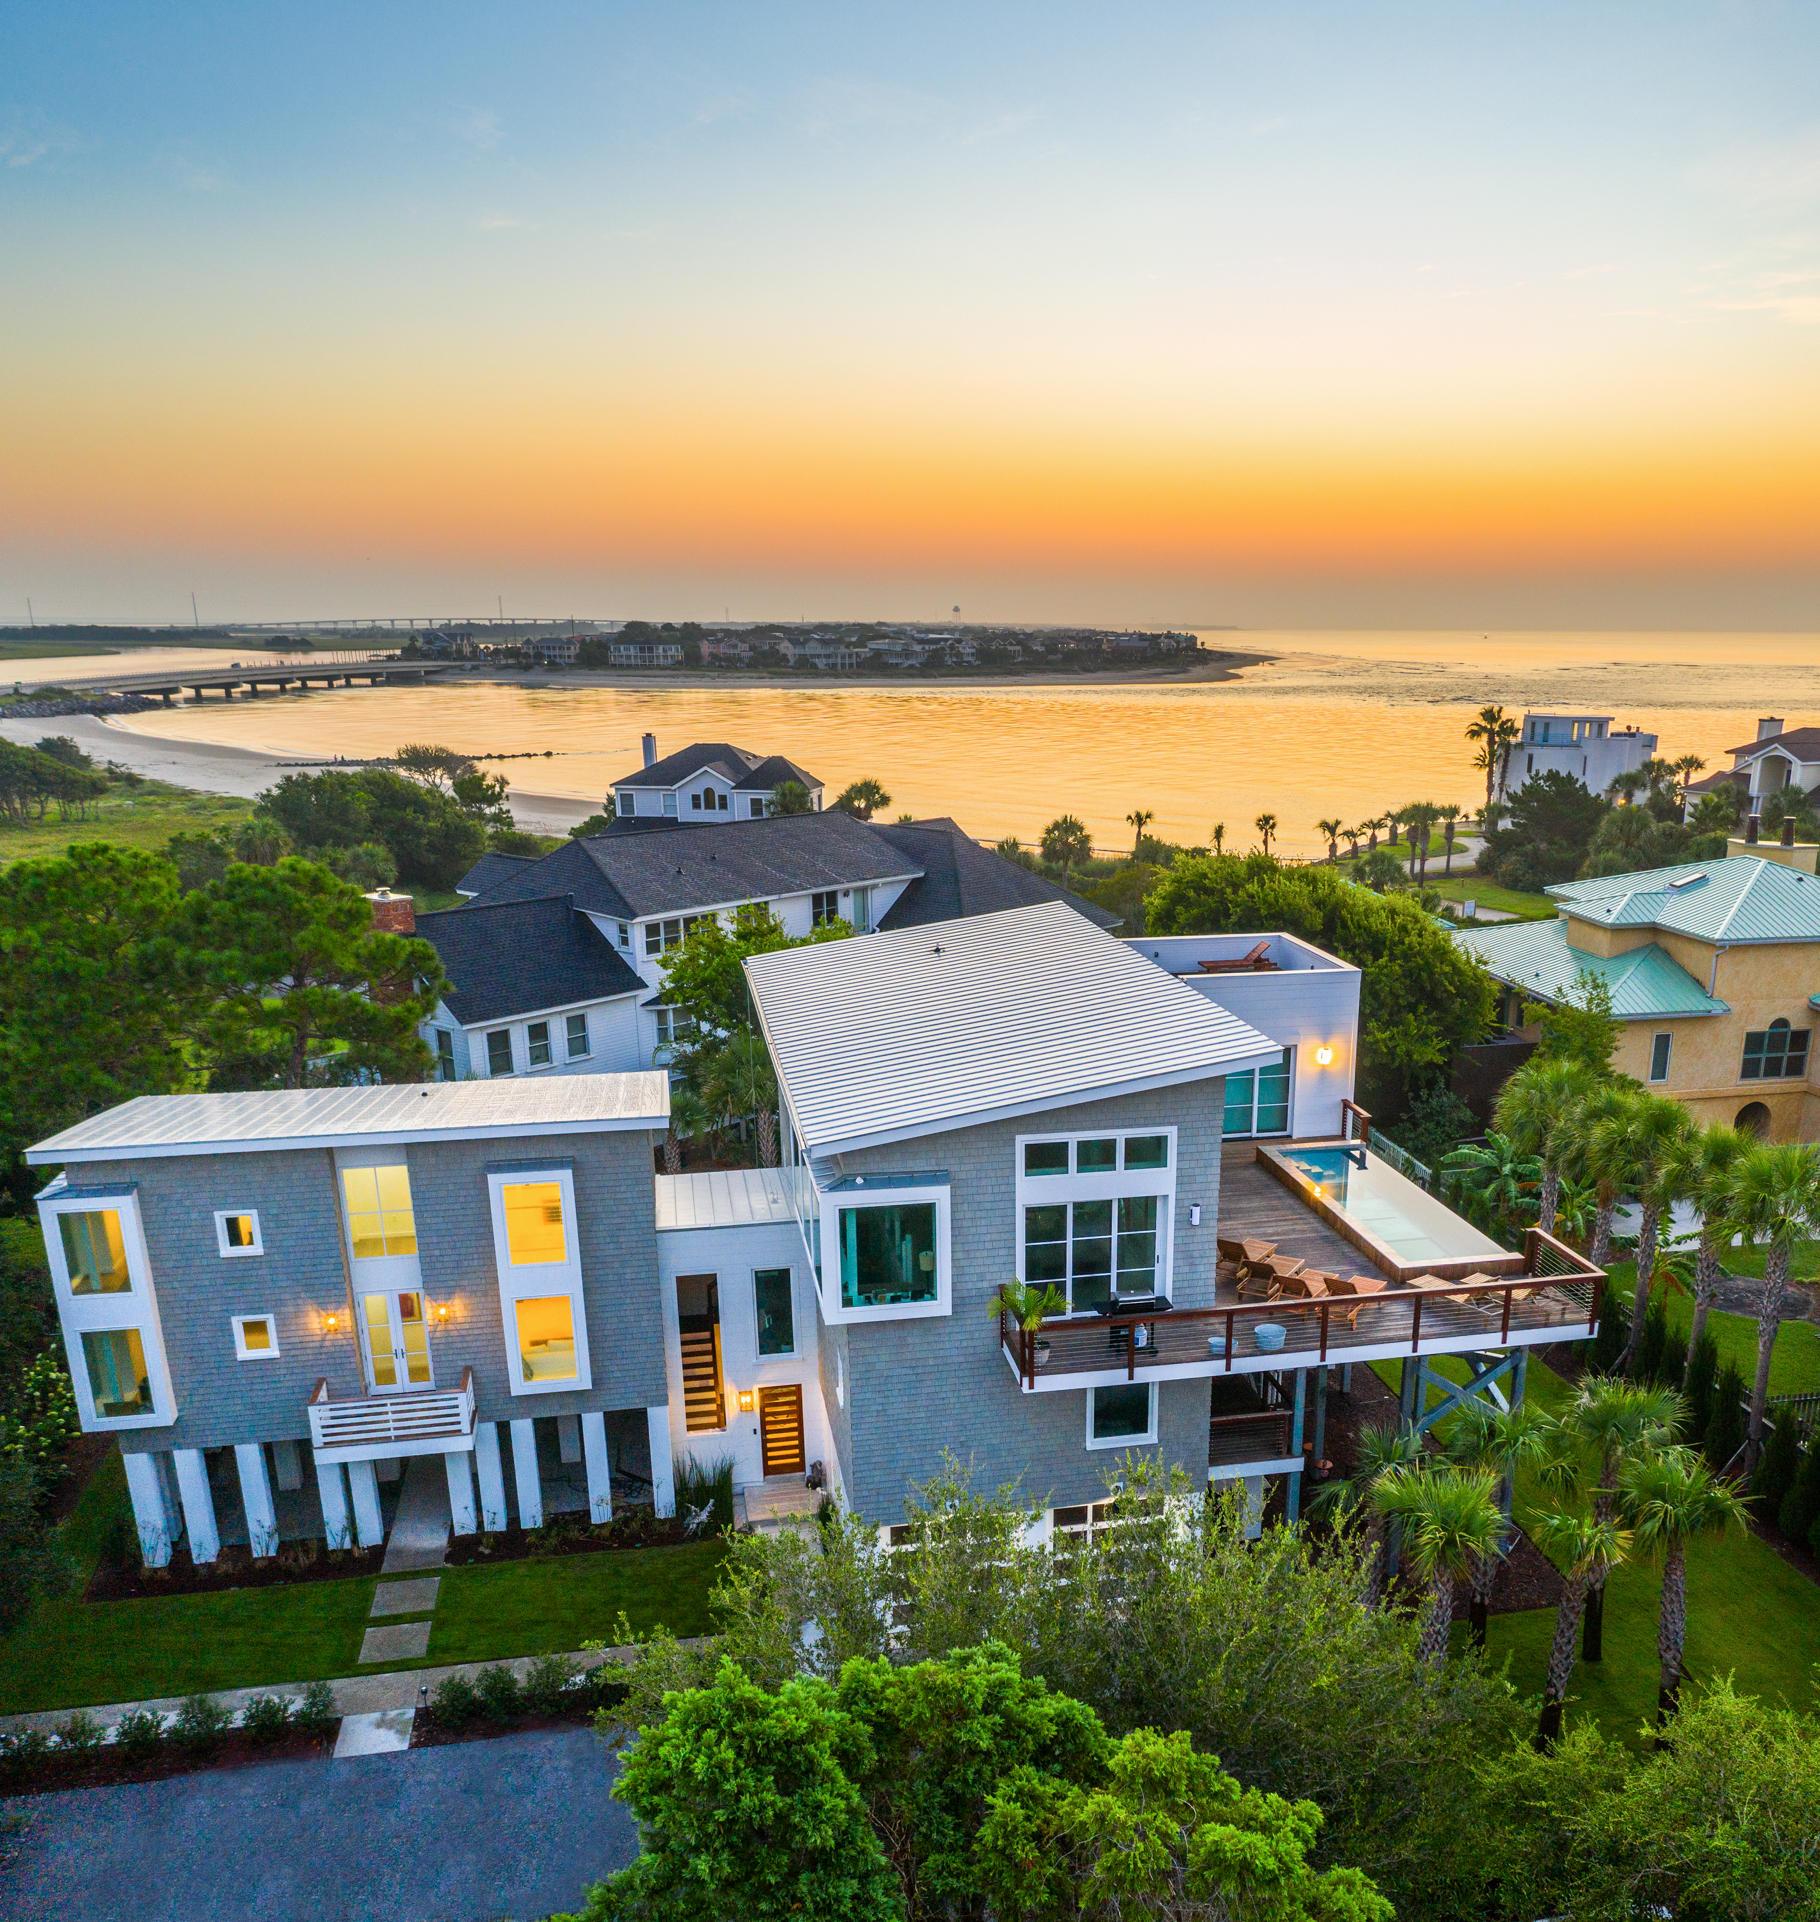 Sullivans Island Homes For Sale - 3115 Ion, Sullivans Island, SC - 2